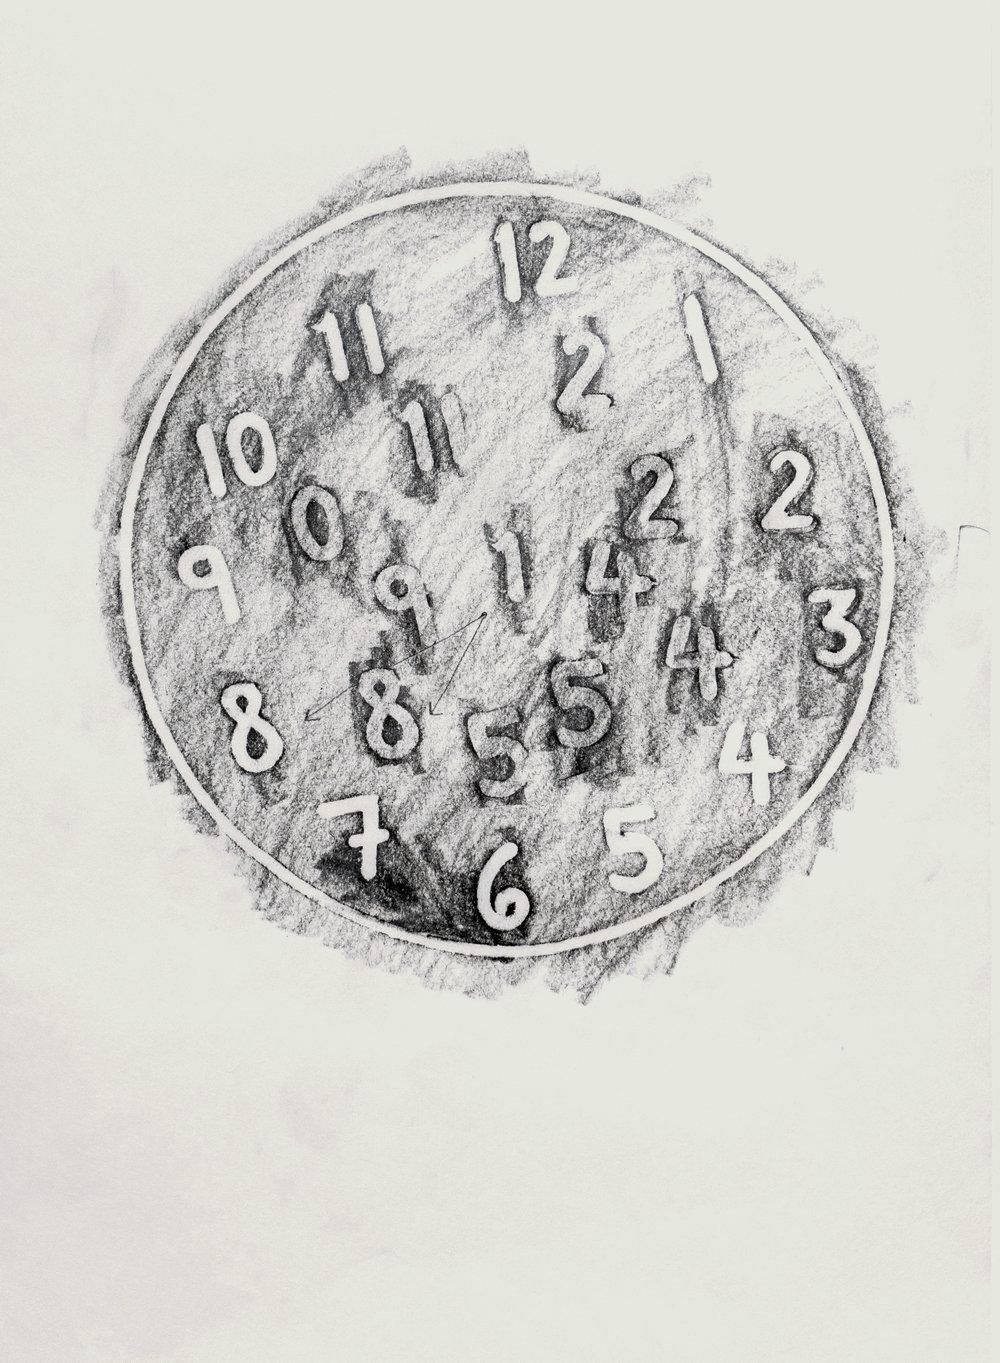 clock_rubbings_0014_Layer 5.jpg